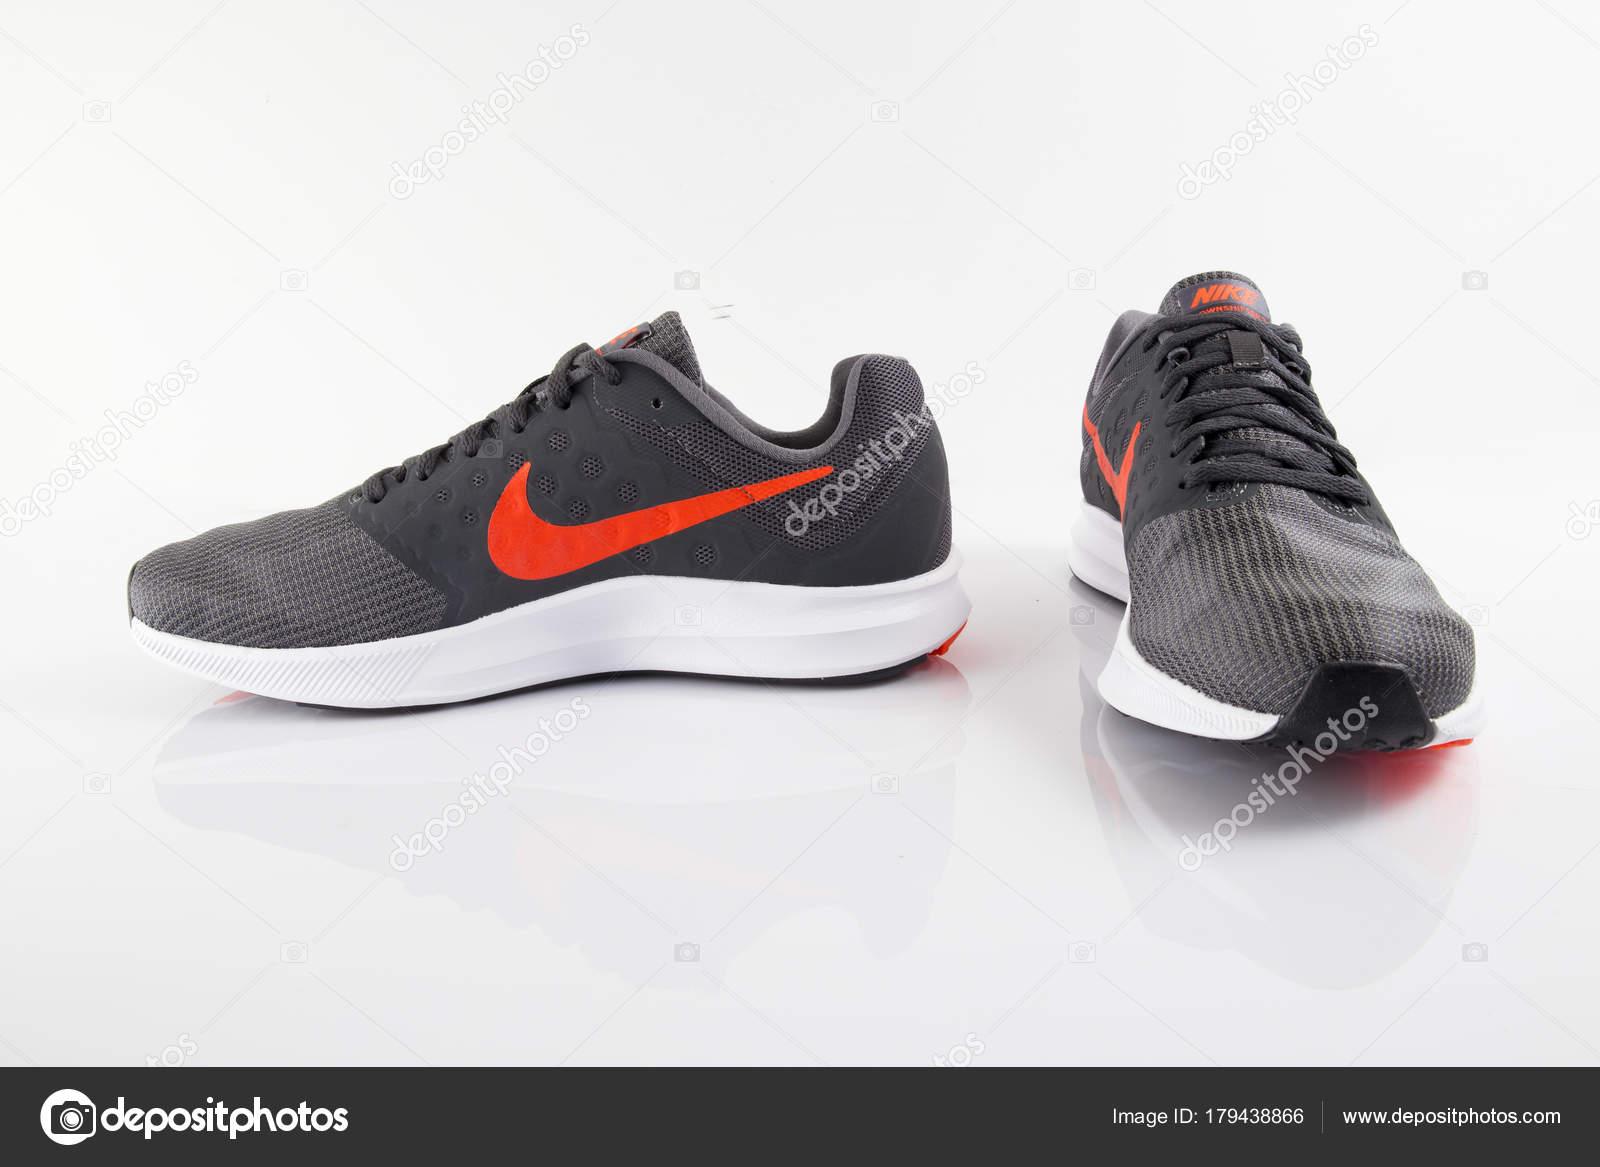 huge discount 8328a 548fd Portugal Empresa Zapatilla Multinacional Nike Aislado Fútbol 2018 Enero  UwqUHZr